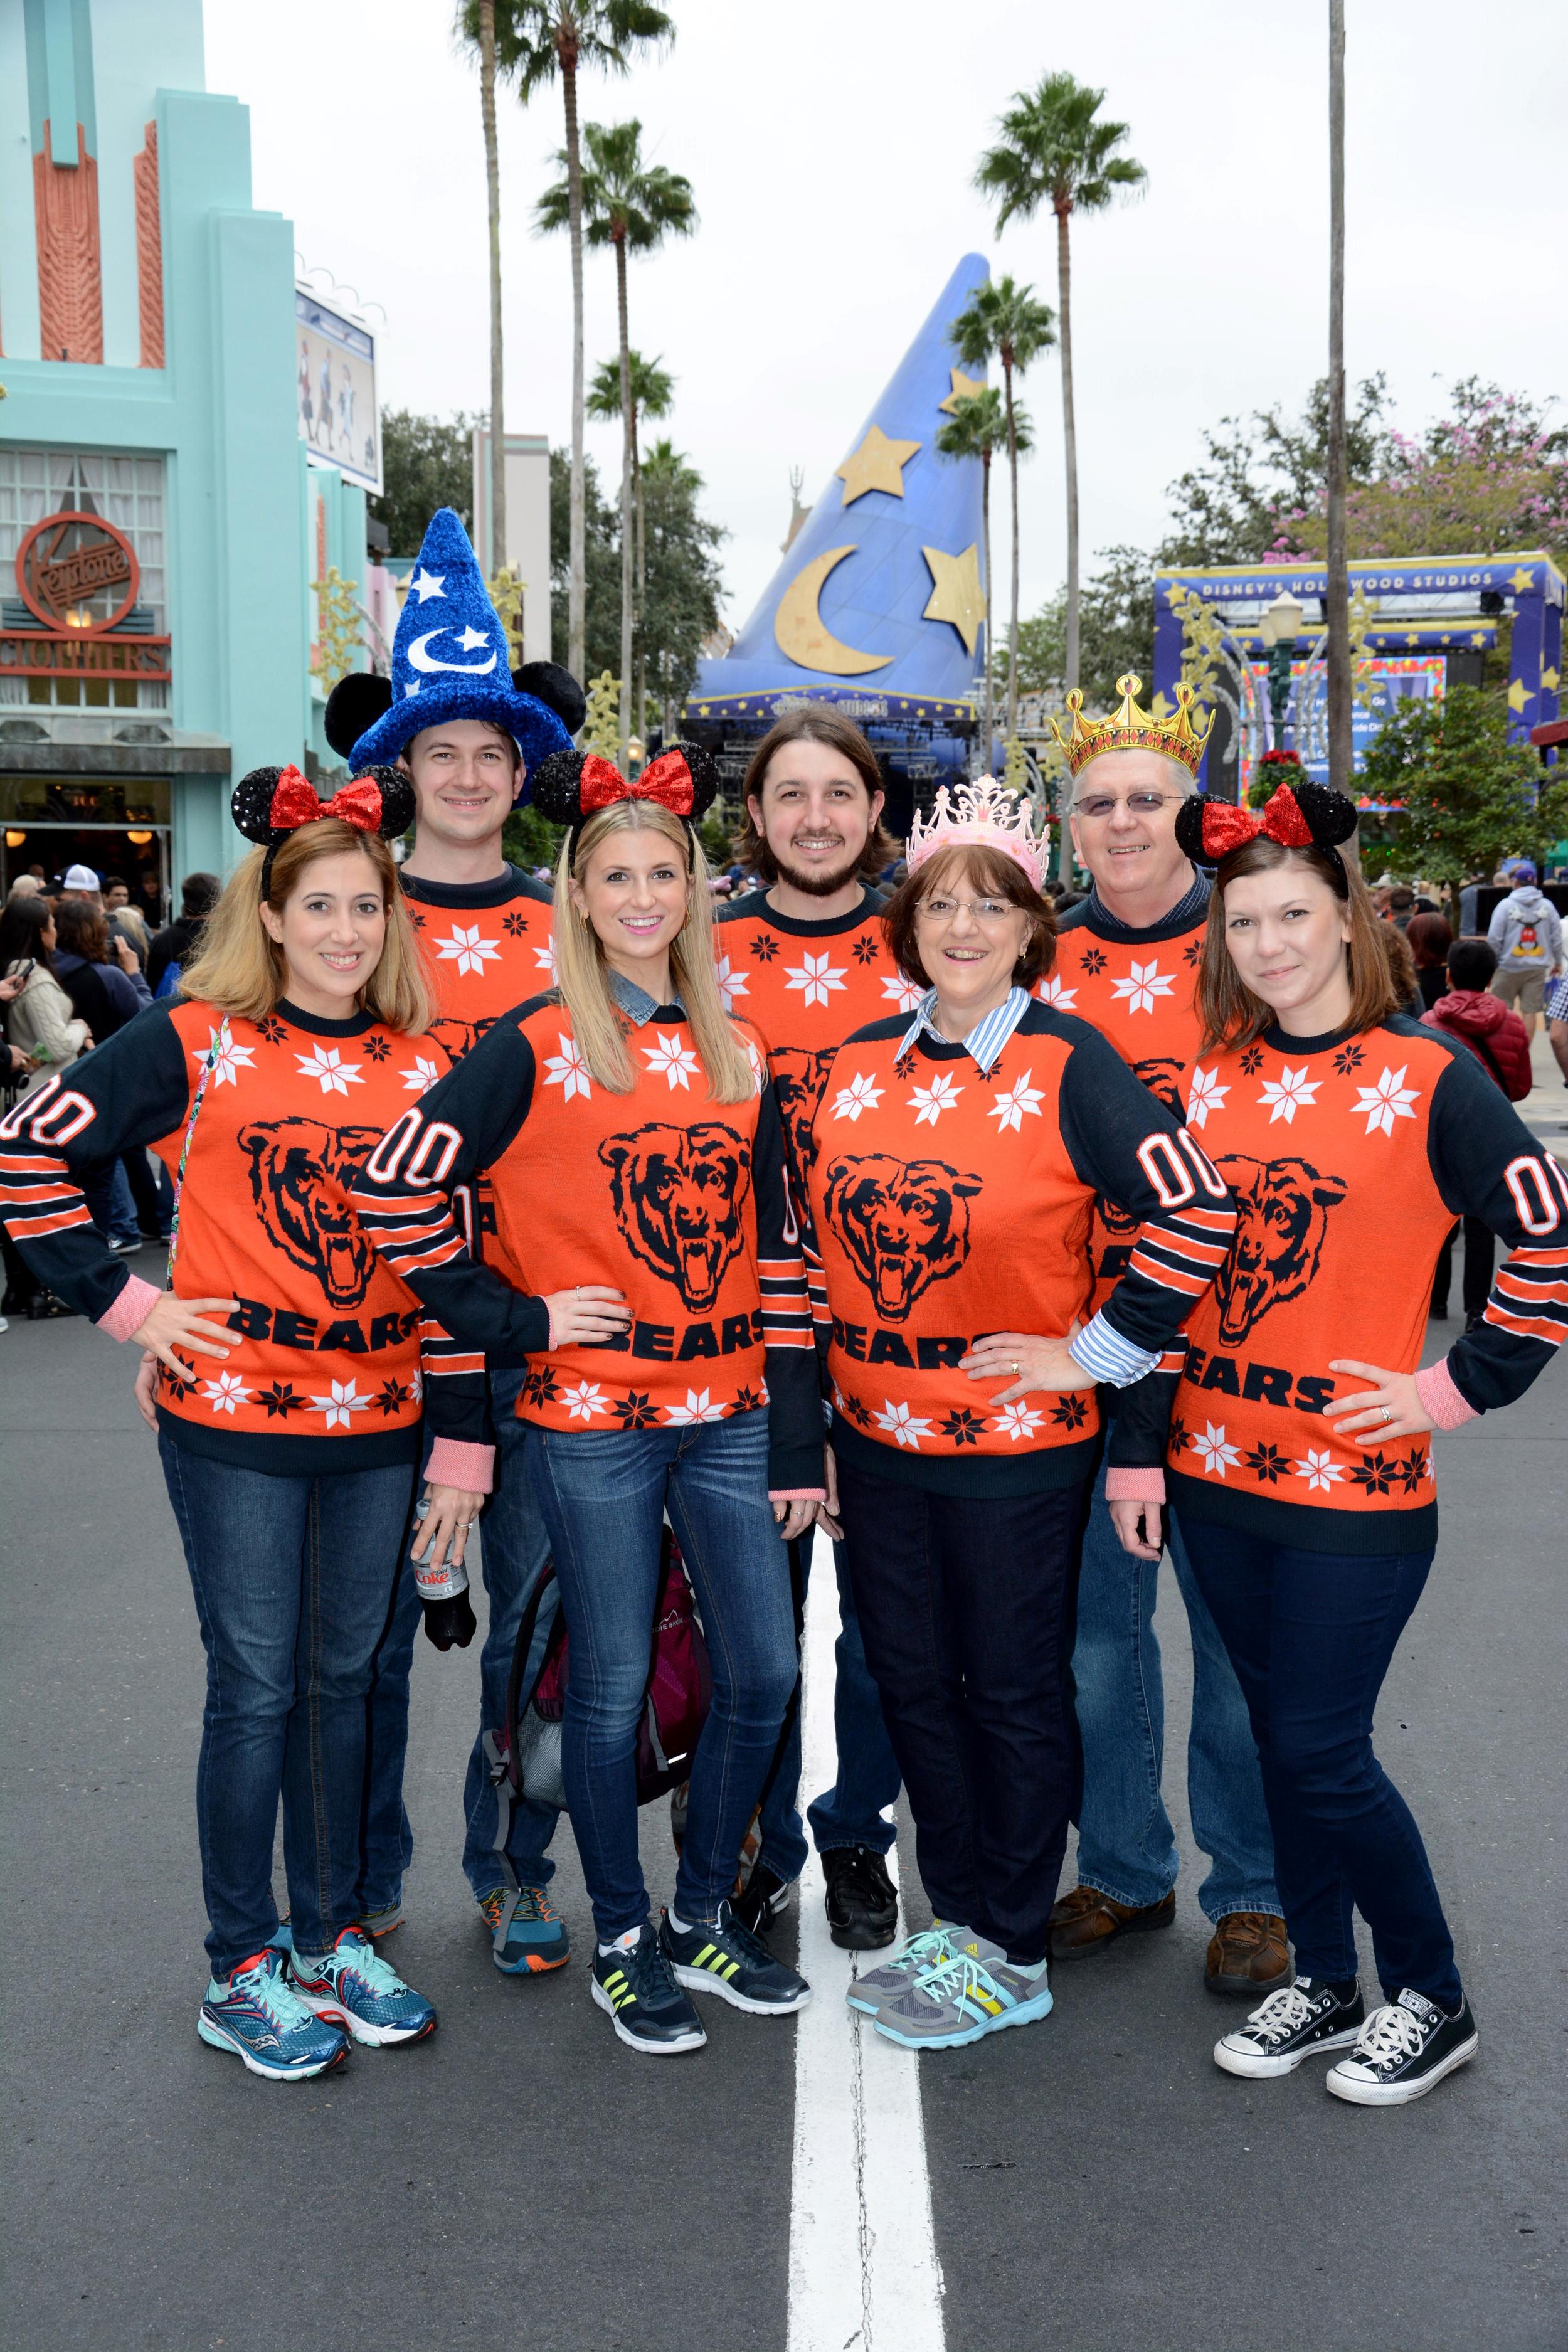 L to R: Amanda, Kevin, me, Brandon, Mom, Dad, & Jen